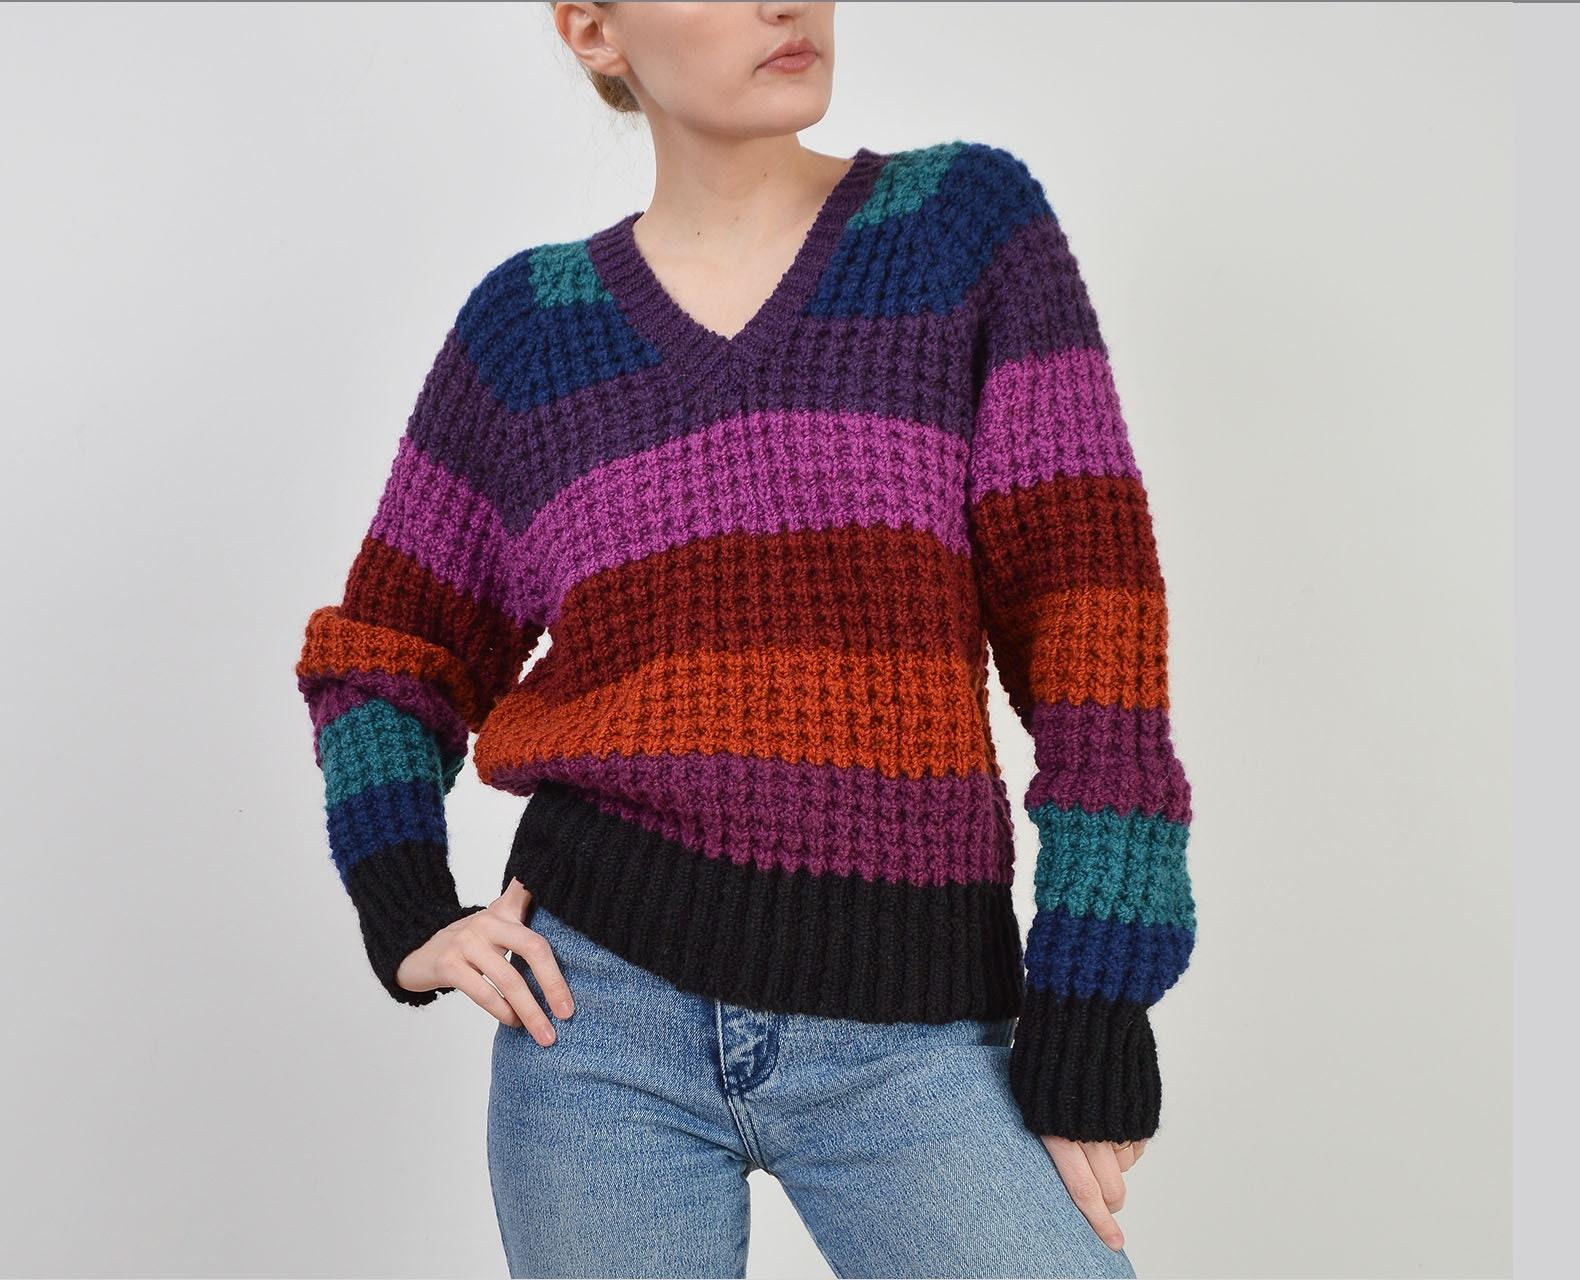 80s Sweatshirts, Sweaters, Vests | Women Vintage 80S Striped Sweater  Jewel Tone Nubby Wool Blend Knit V Neck Size S M $40.00 AT vintagedancer.com